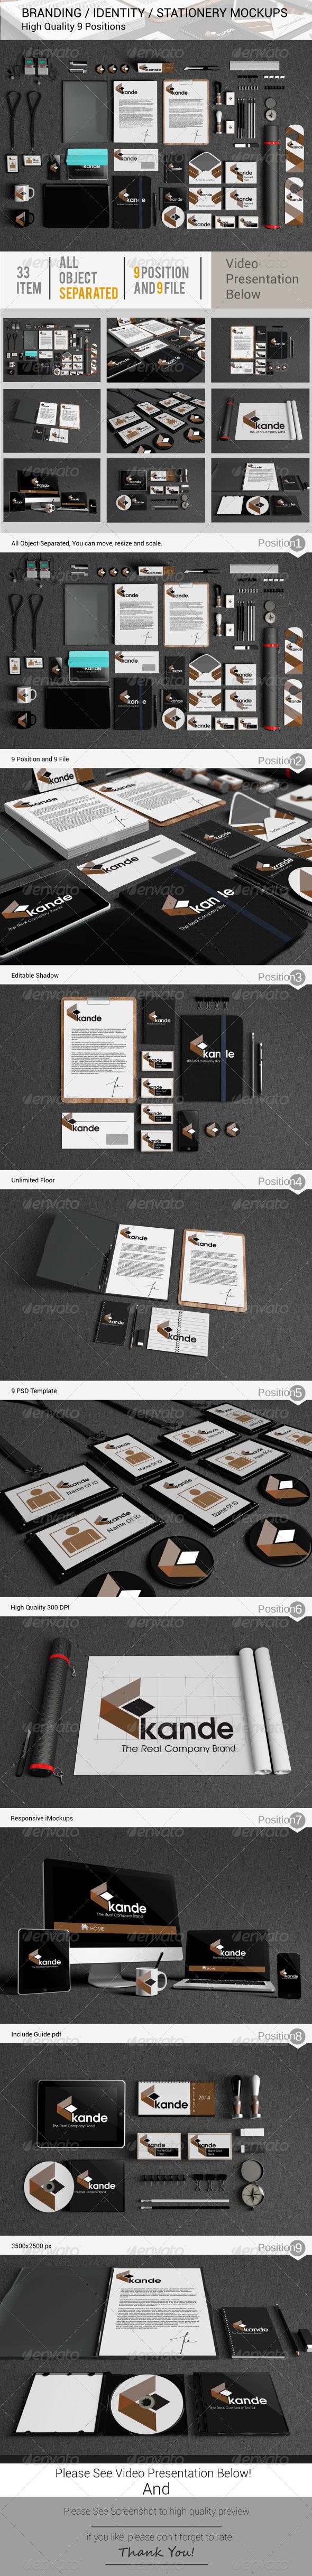 Branding / Identity / Stationery Mockups - Print Product Mock-Ups